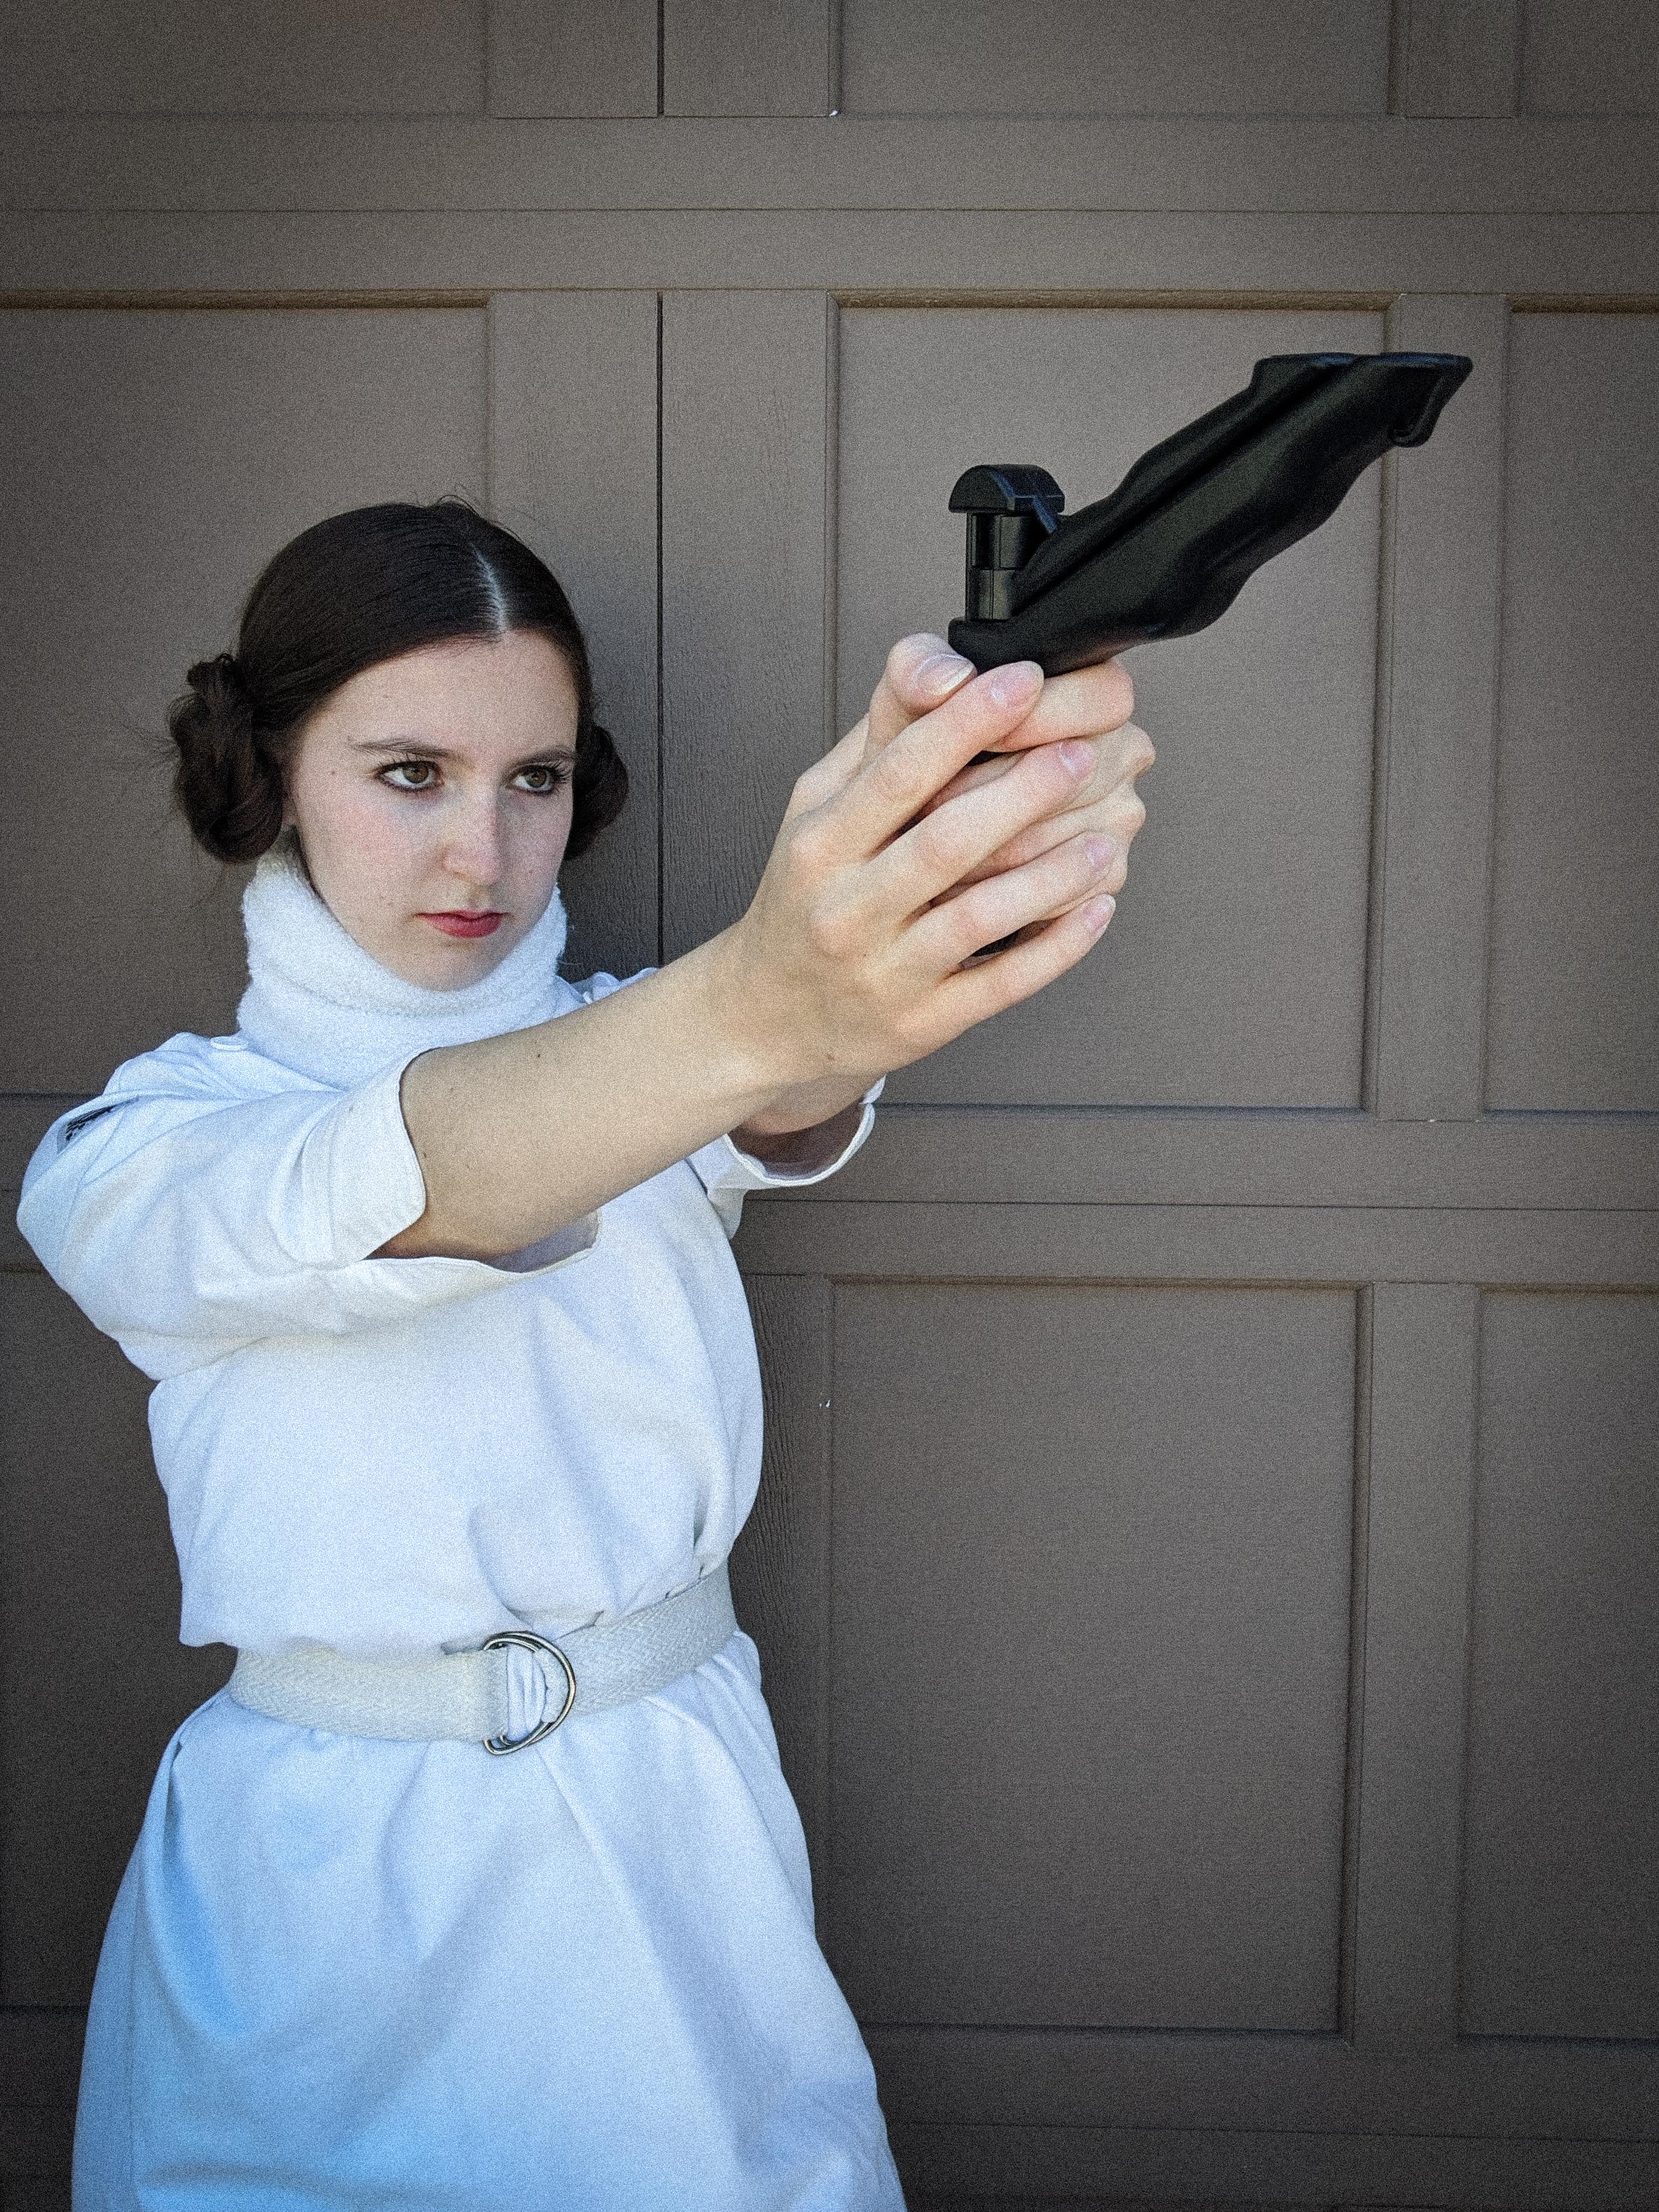 Princess Leia, homemade costume, Star Wars nerd